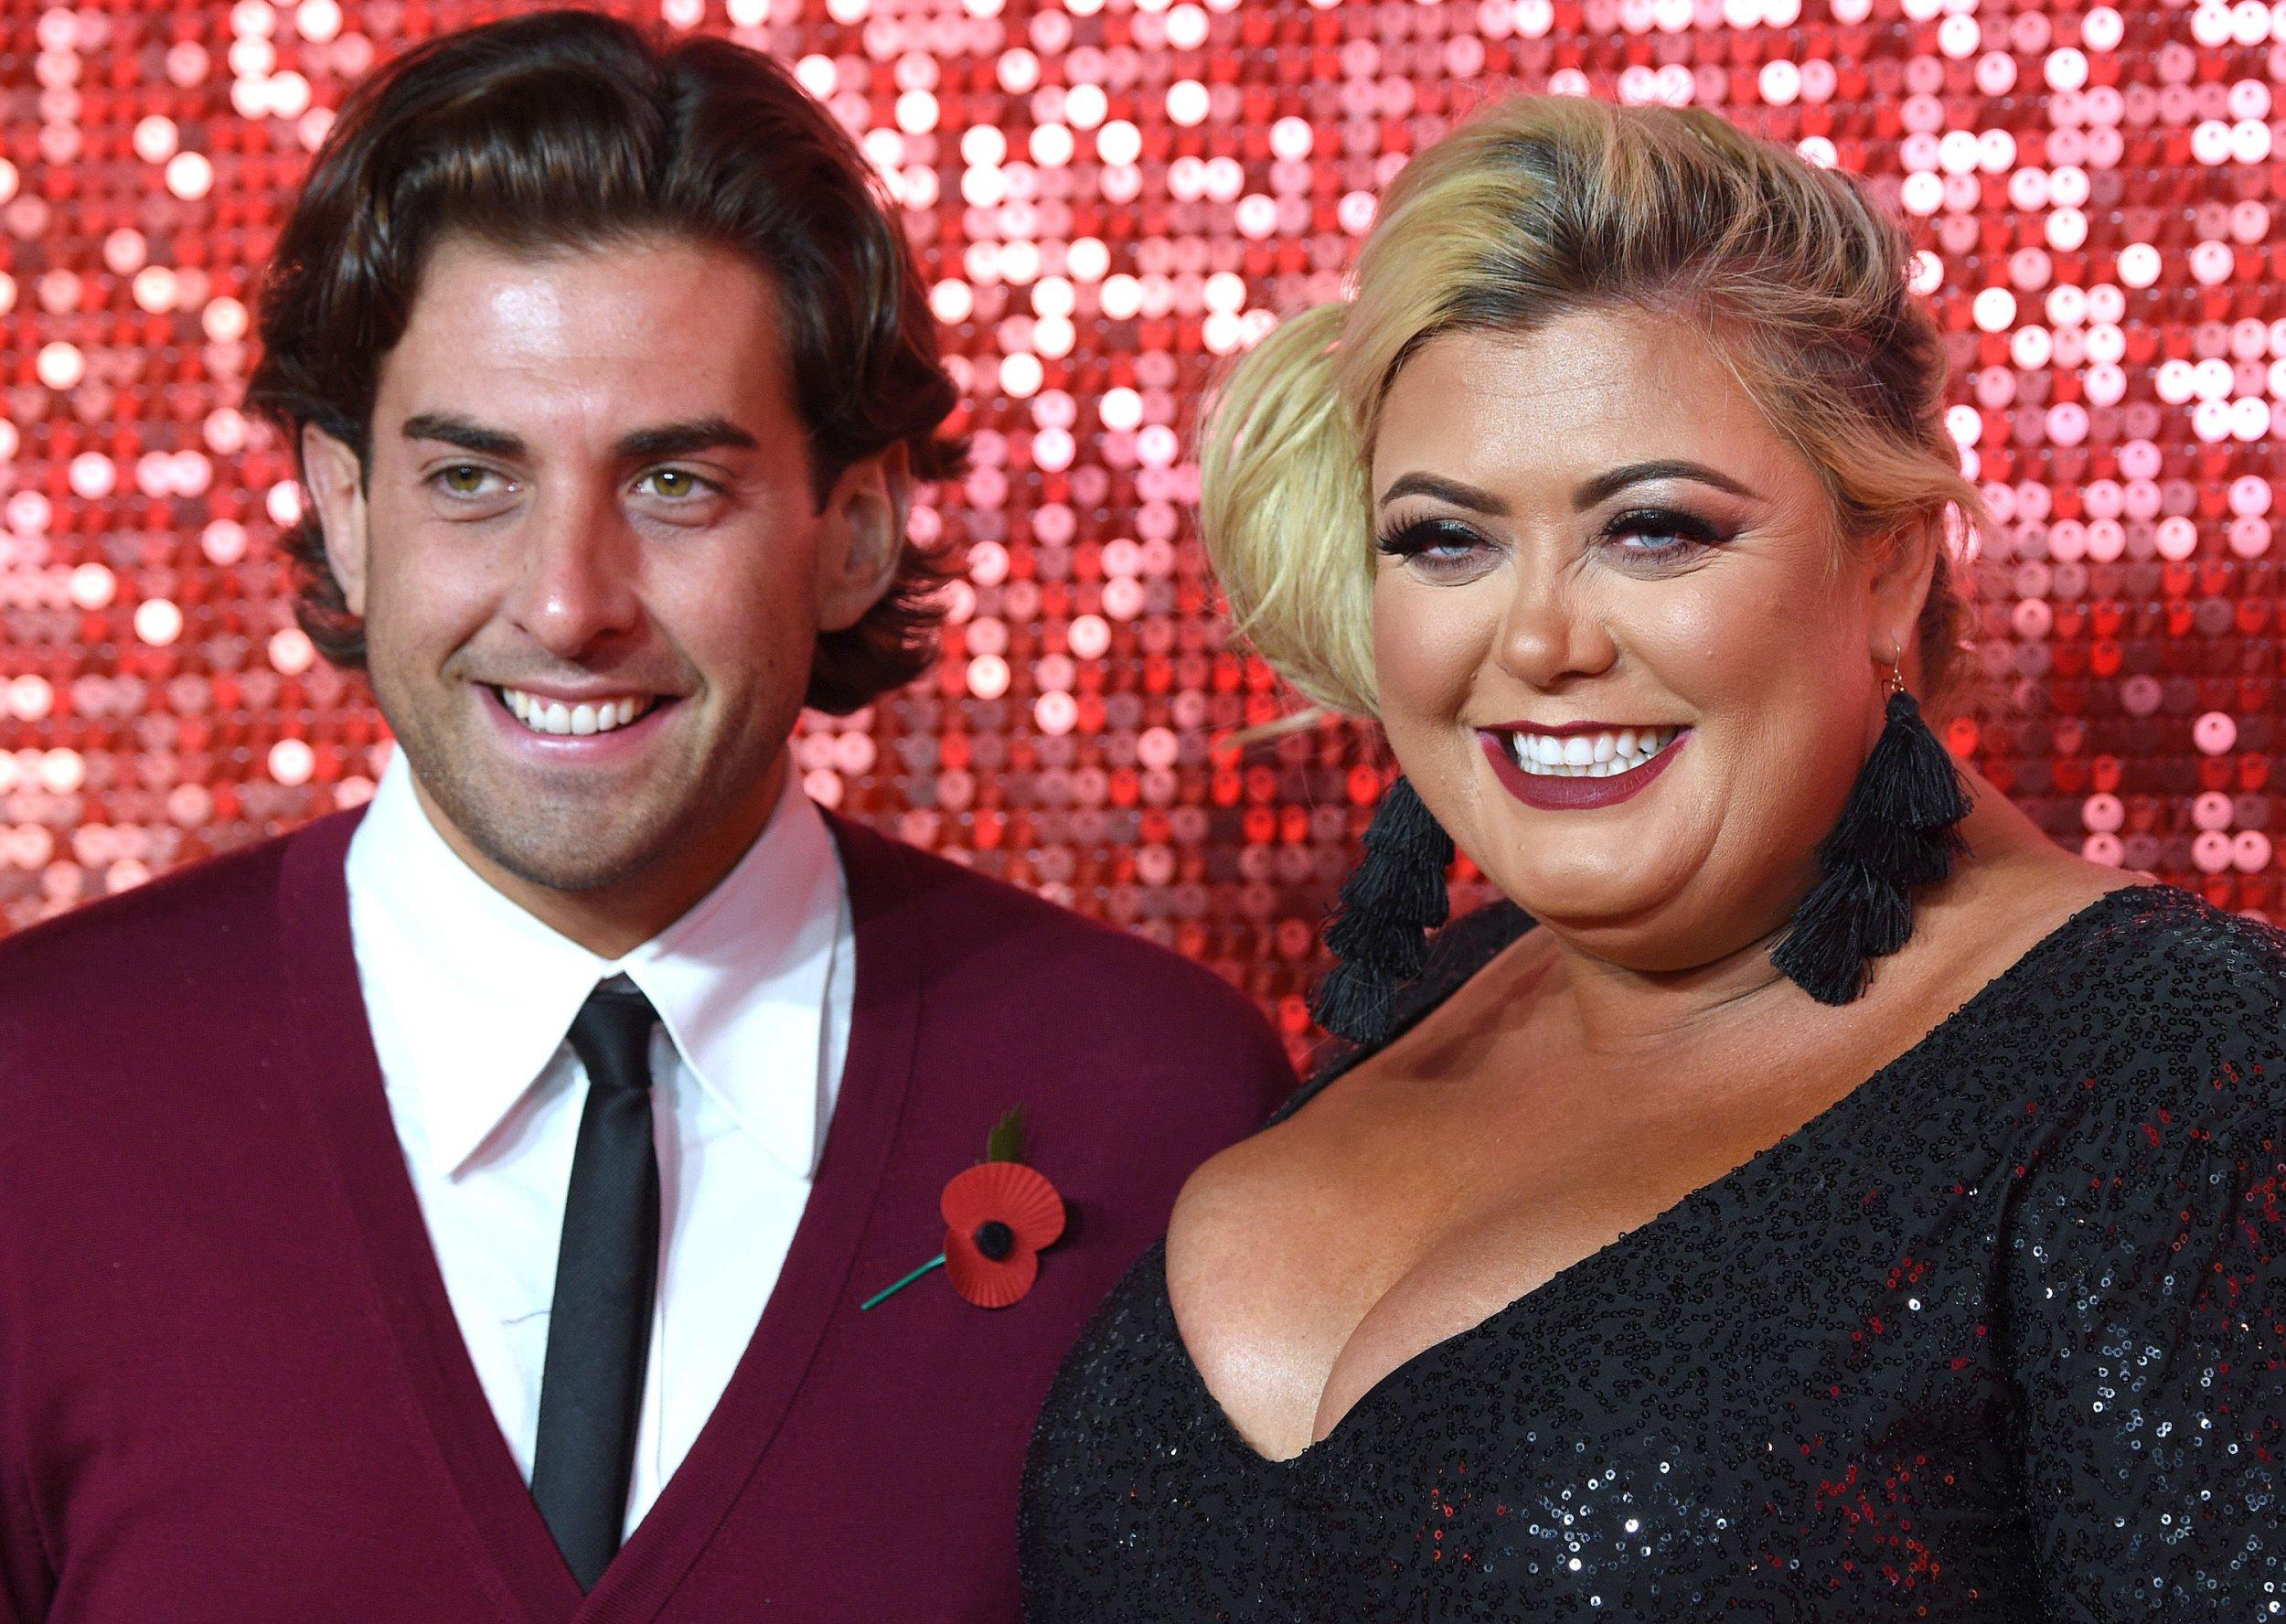 Mandatory Credit: Photo by Anthony Harvey/REX/Shutterstock (9215613f) James Argent and Gemma Collins The ITV Gala, Arrivals, London Palladium, UK - 09 Nov 2017